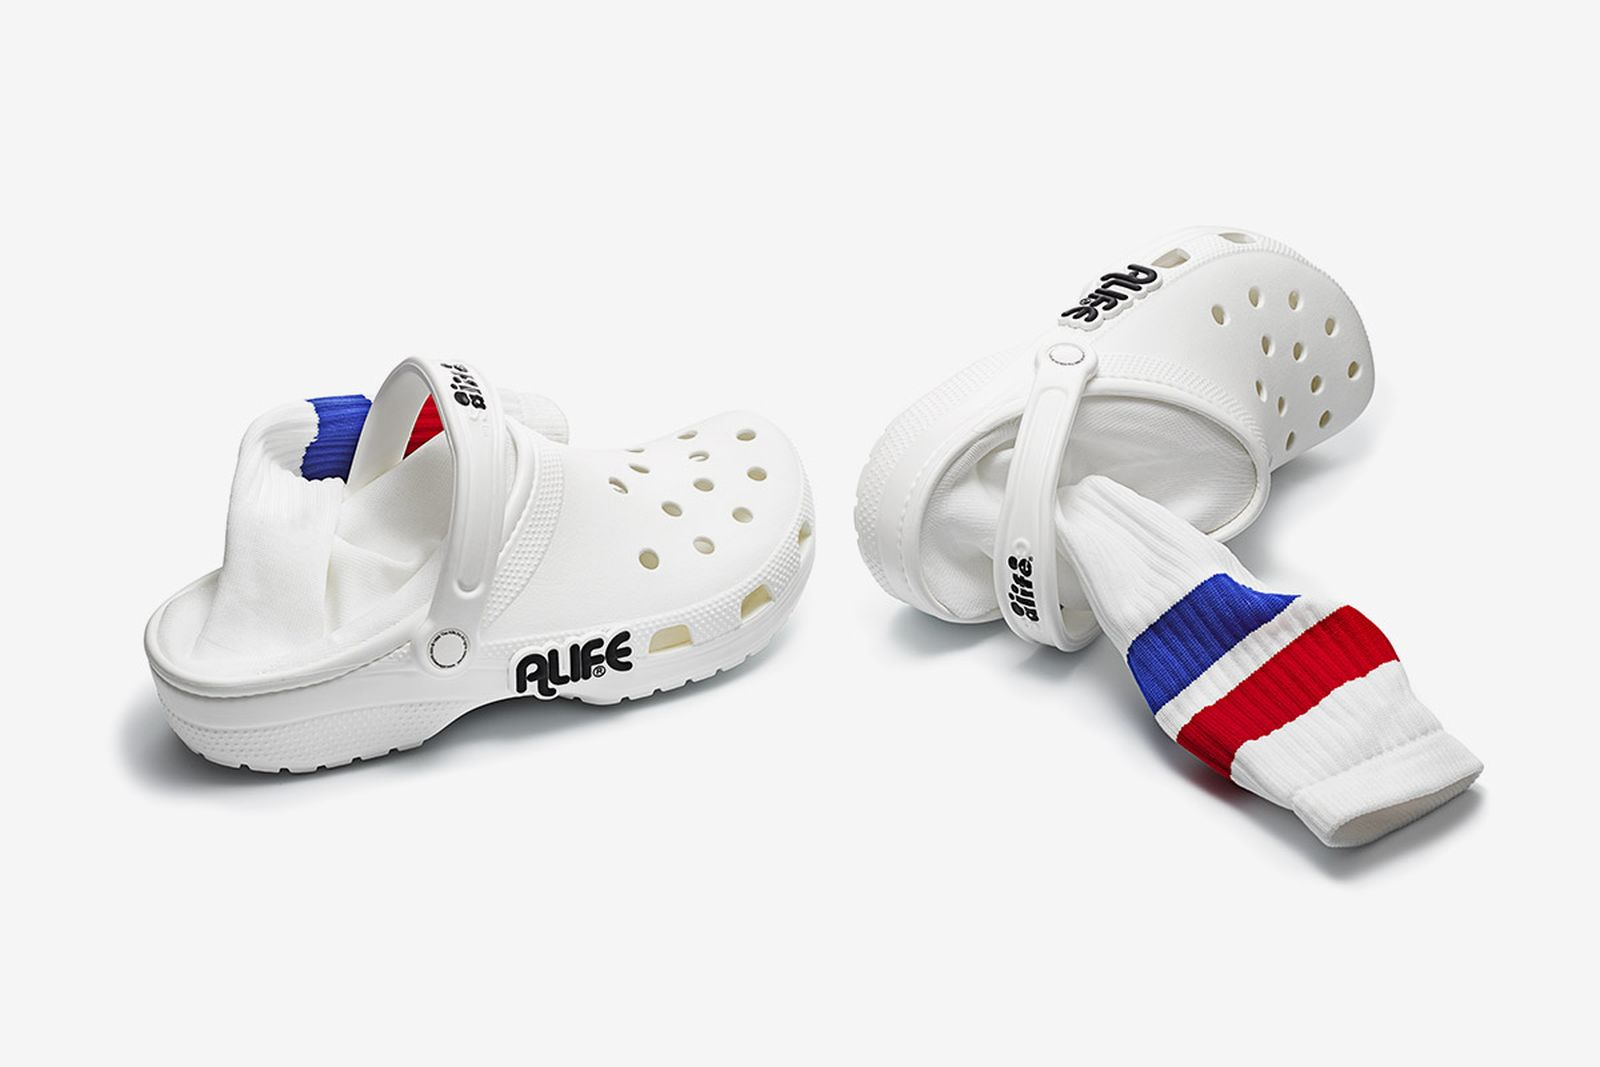 alife-crocs-collaboration-release-date-price-07